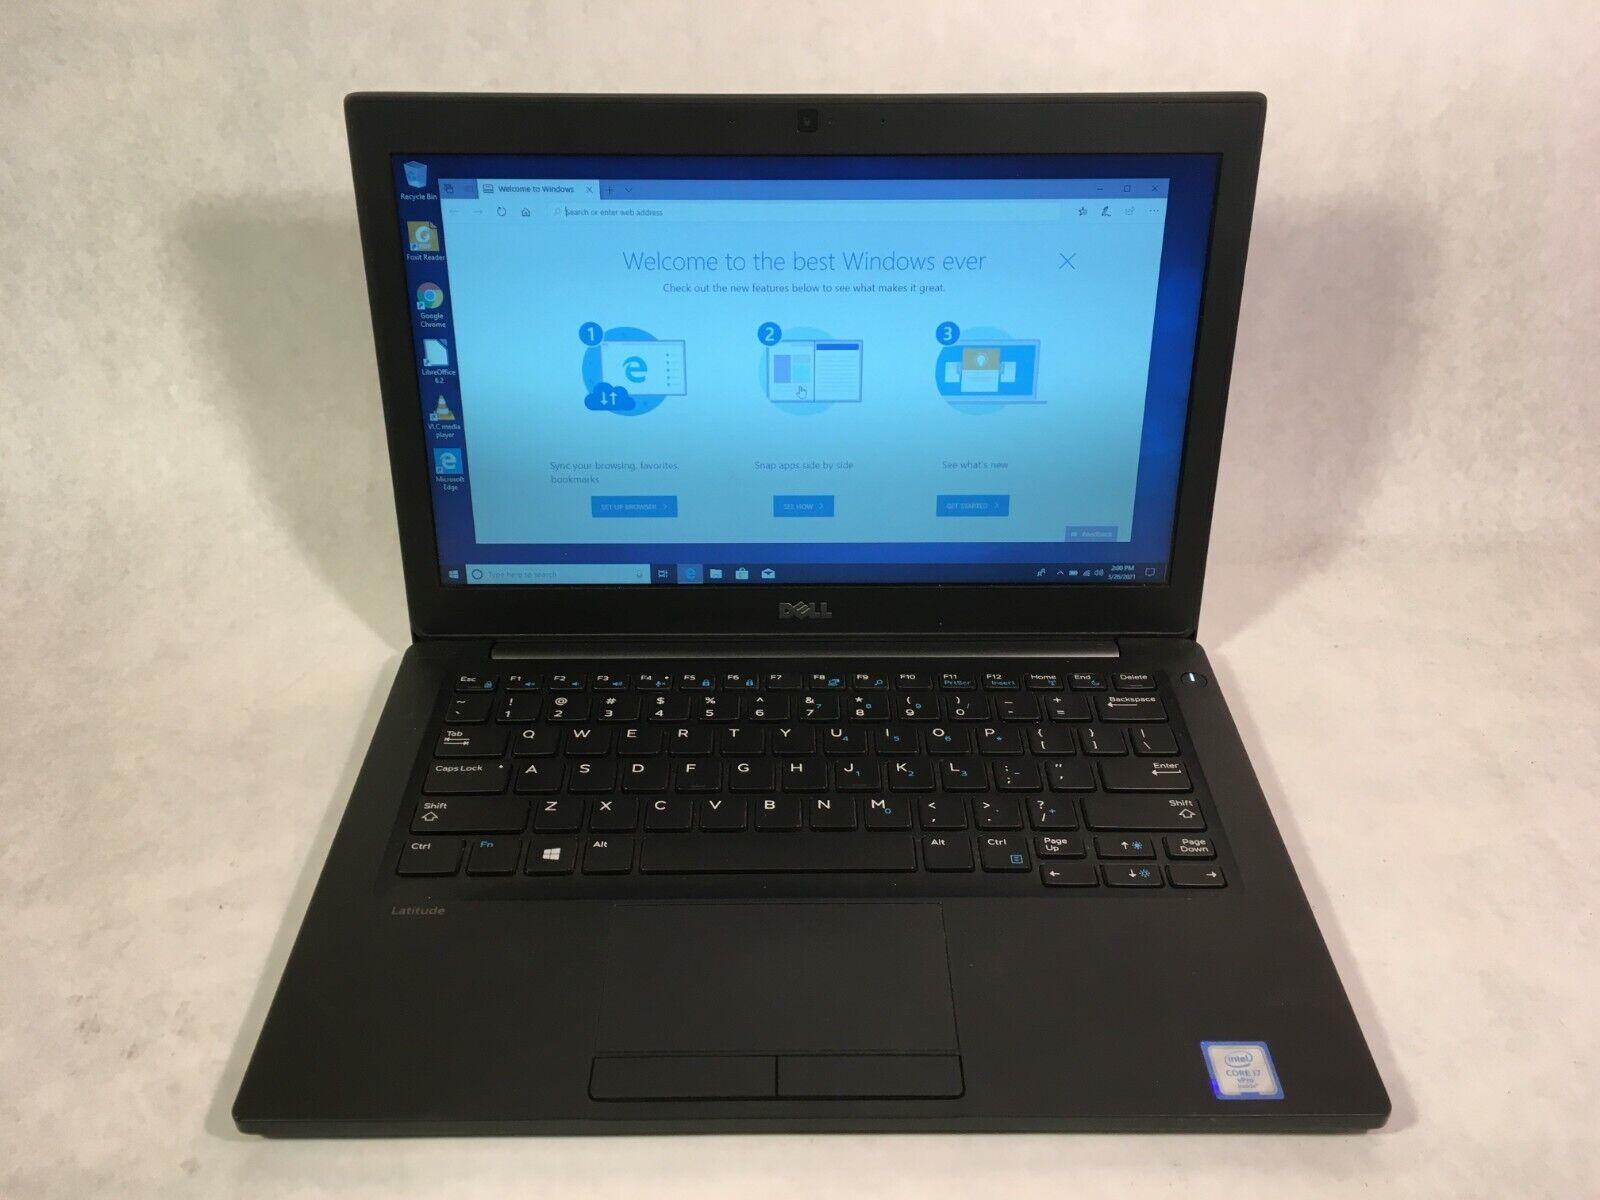 "Laptop Windows - Dell Latitude 7280 12.5"" Laptop Intel i7-6600U 2.6GHz 4GB 128GB SSD Windows 10"